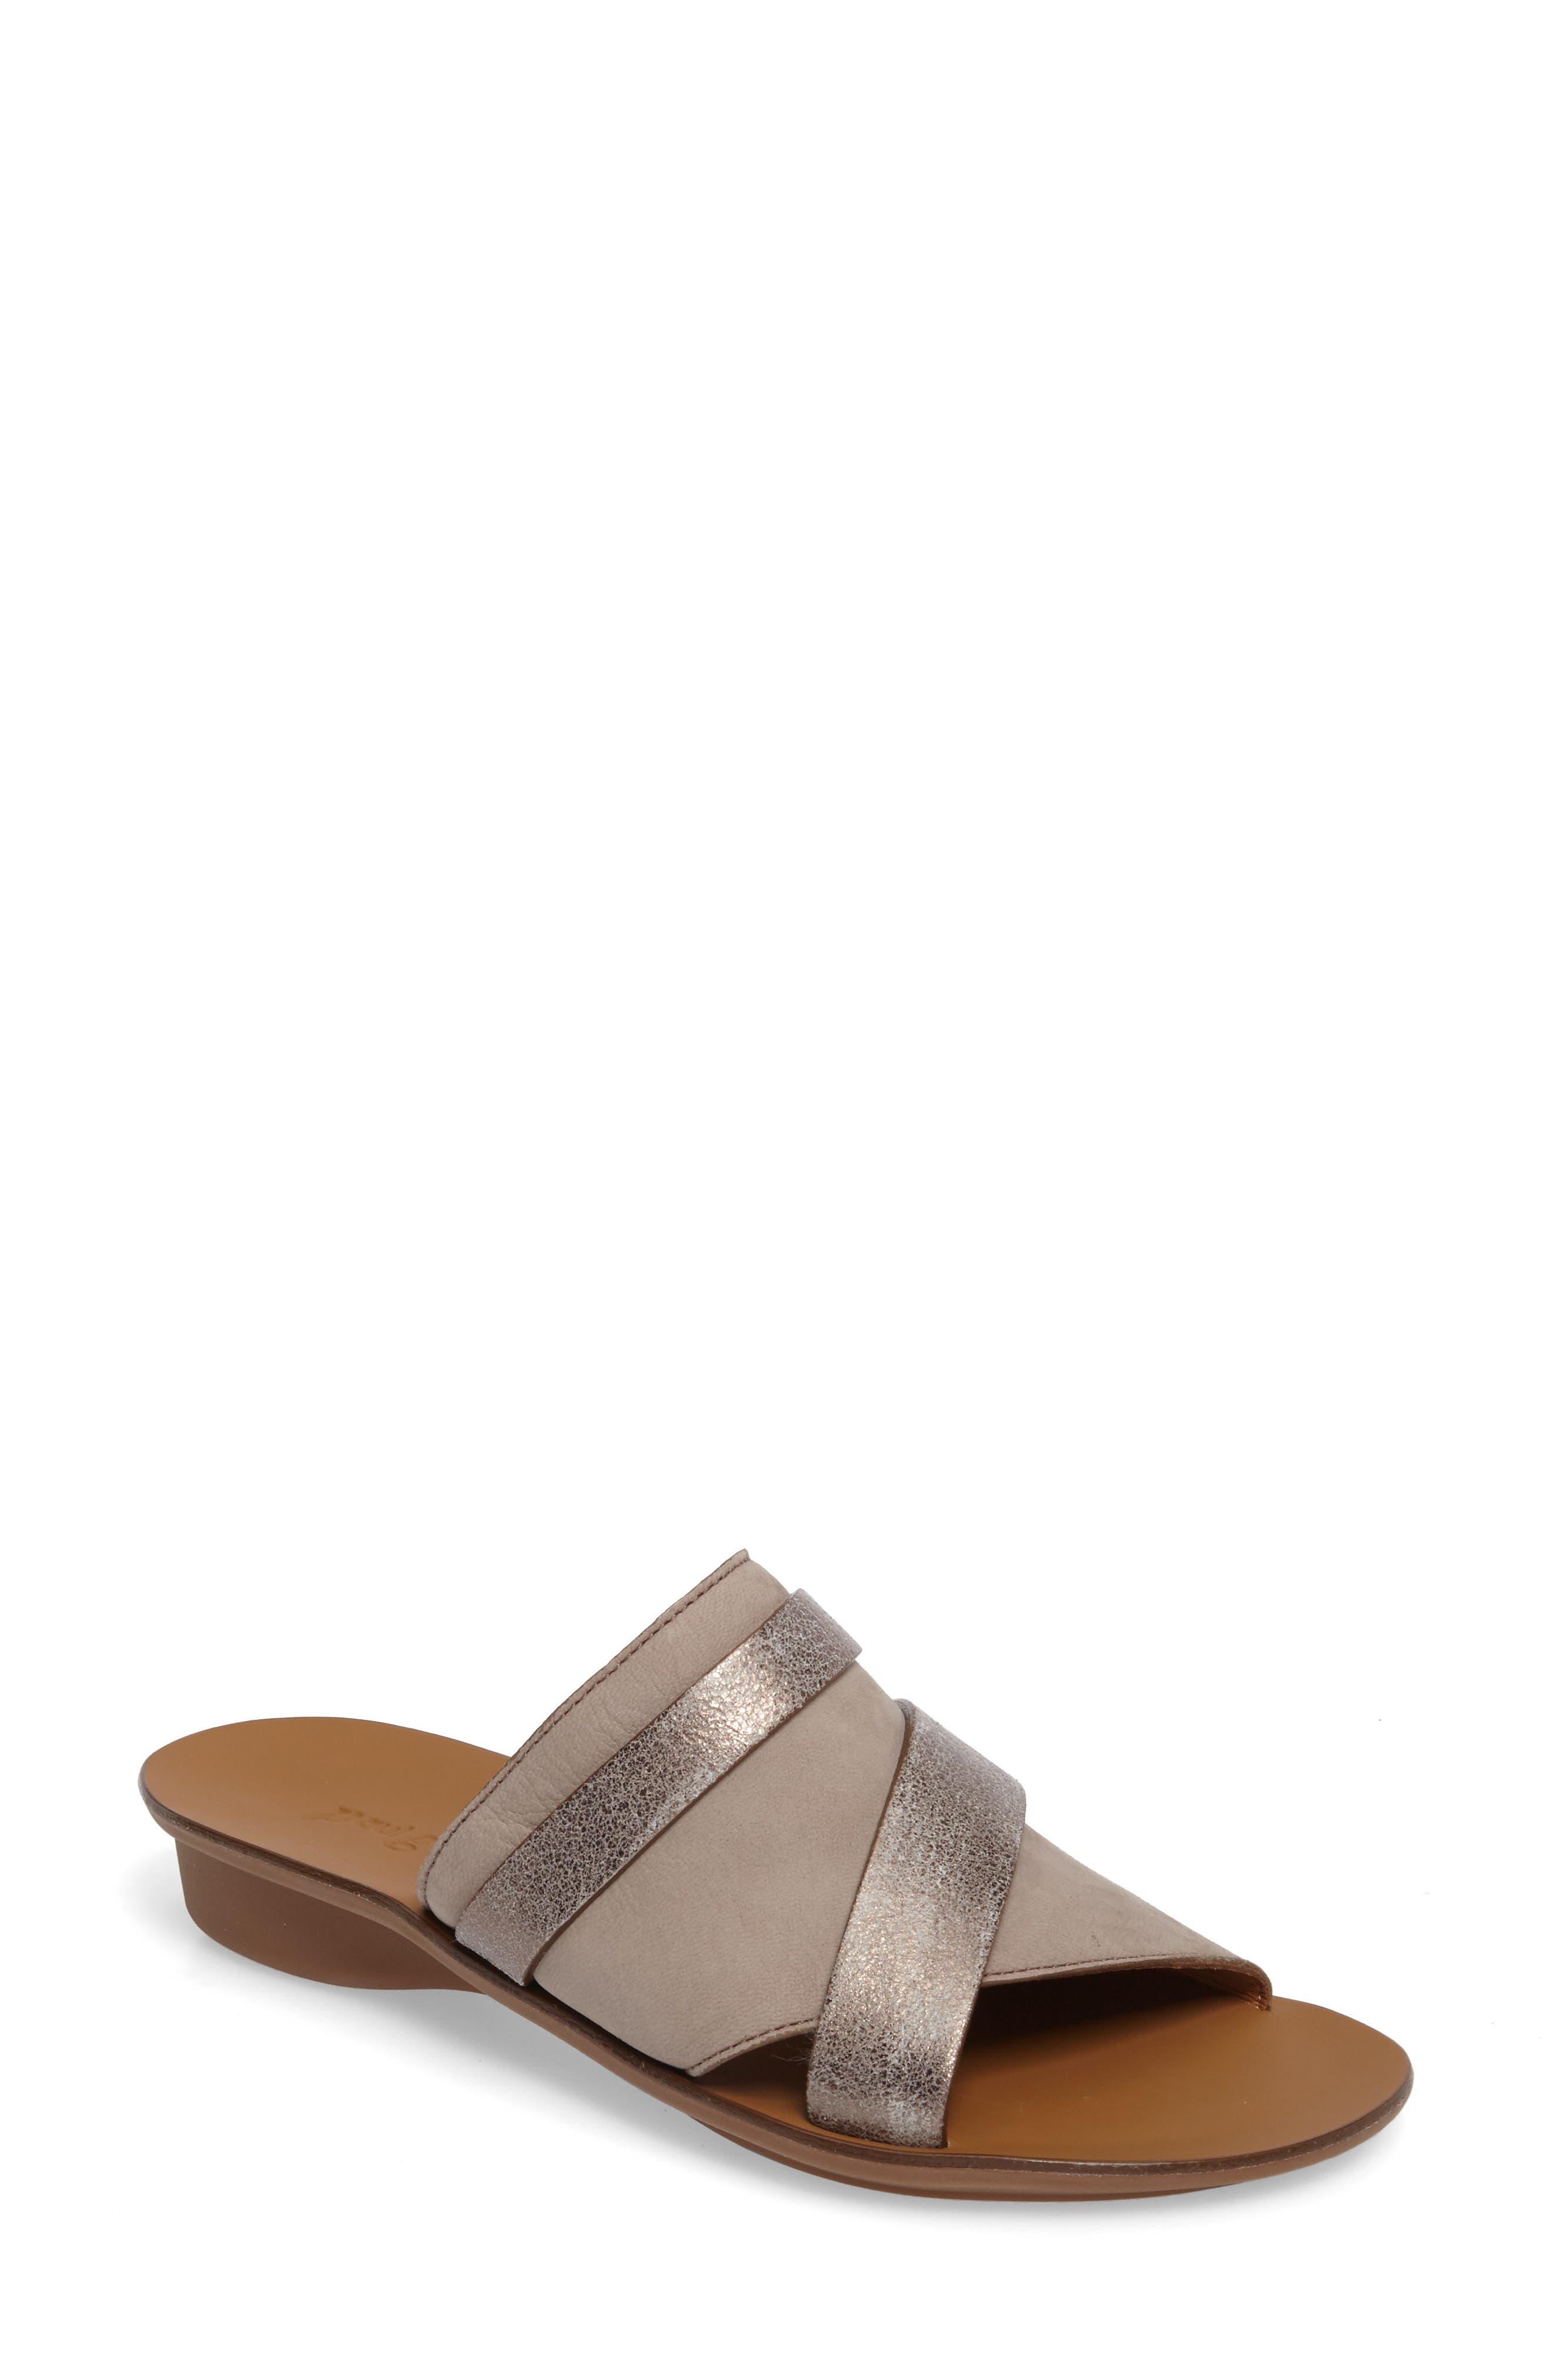 Paul Green 'Bayside' Leather Sandal ...